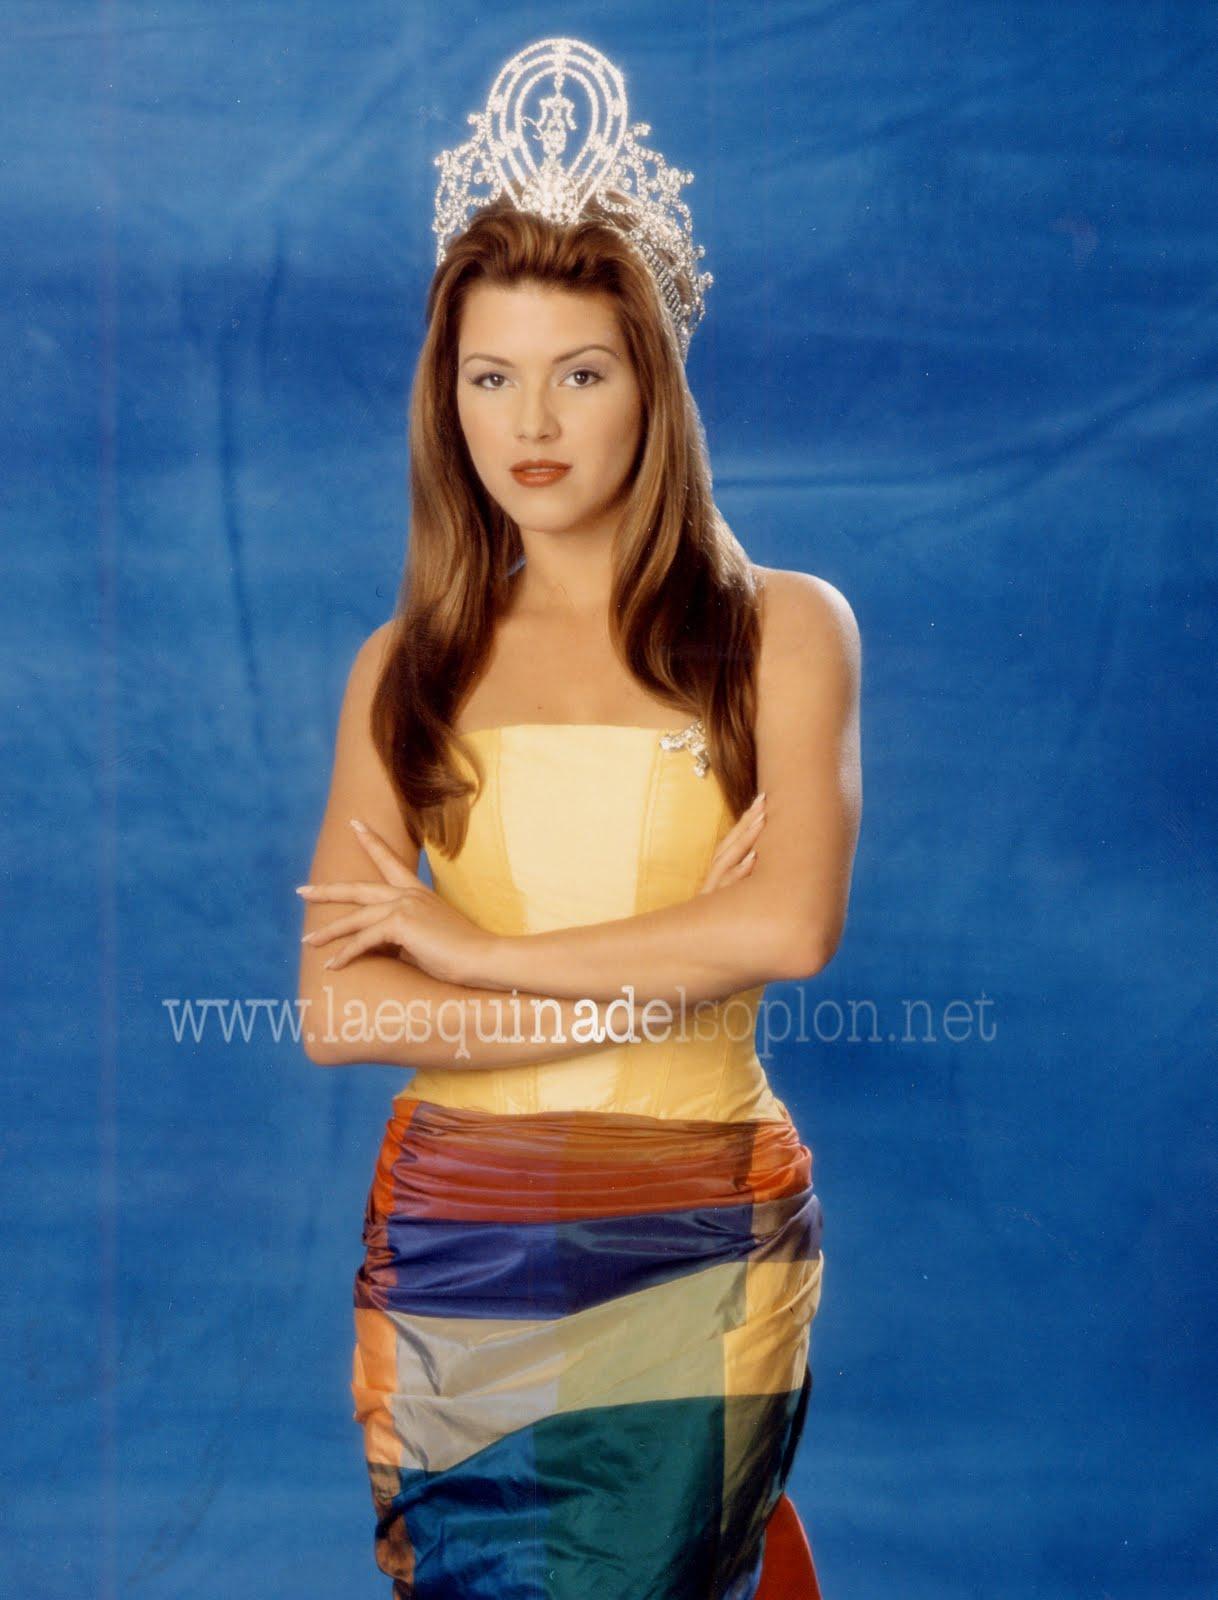 alicia machado, miss universe 1996. Vsa2irf9